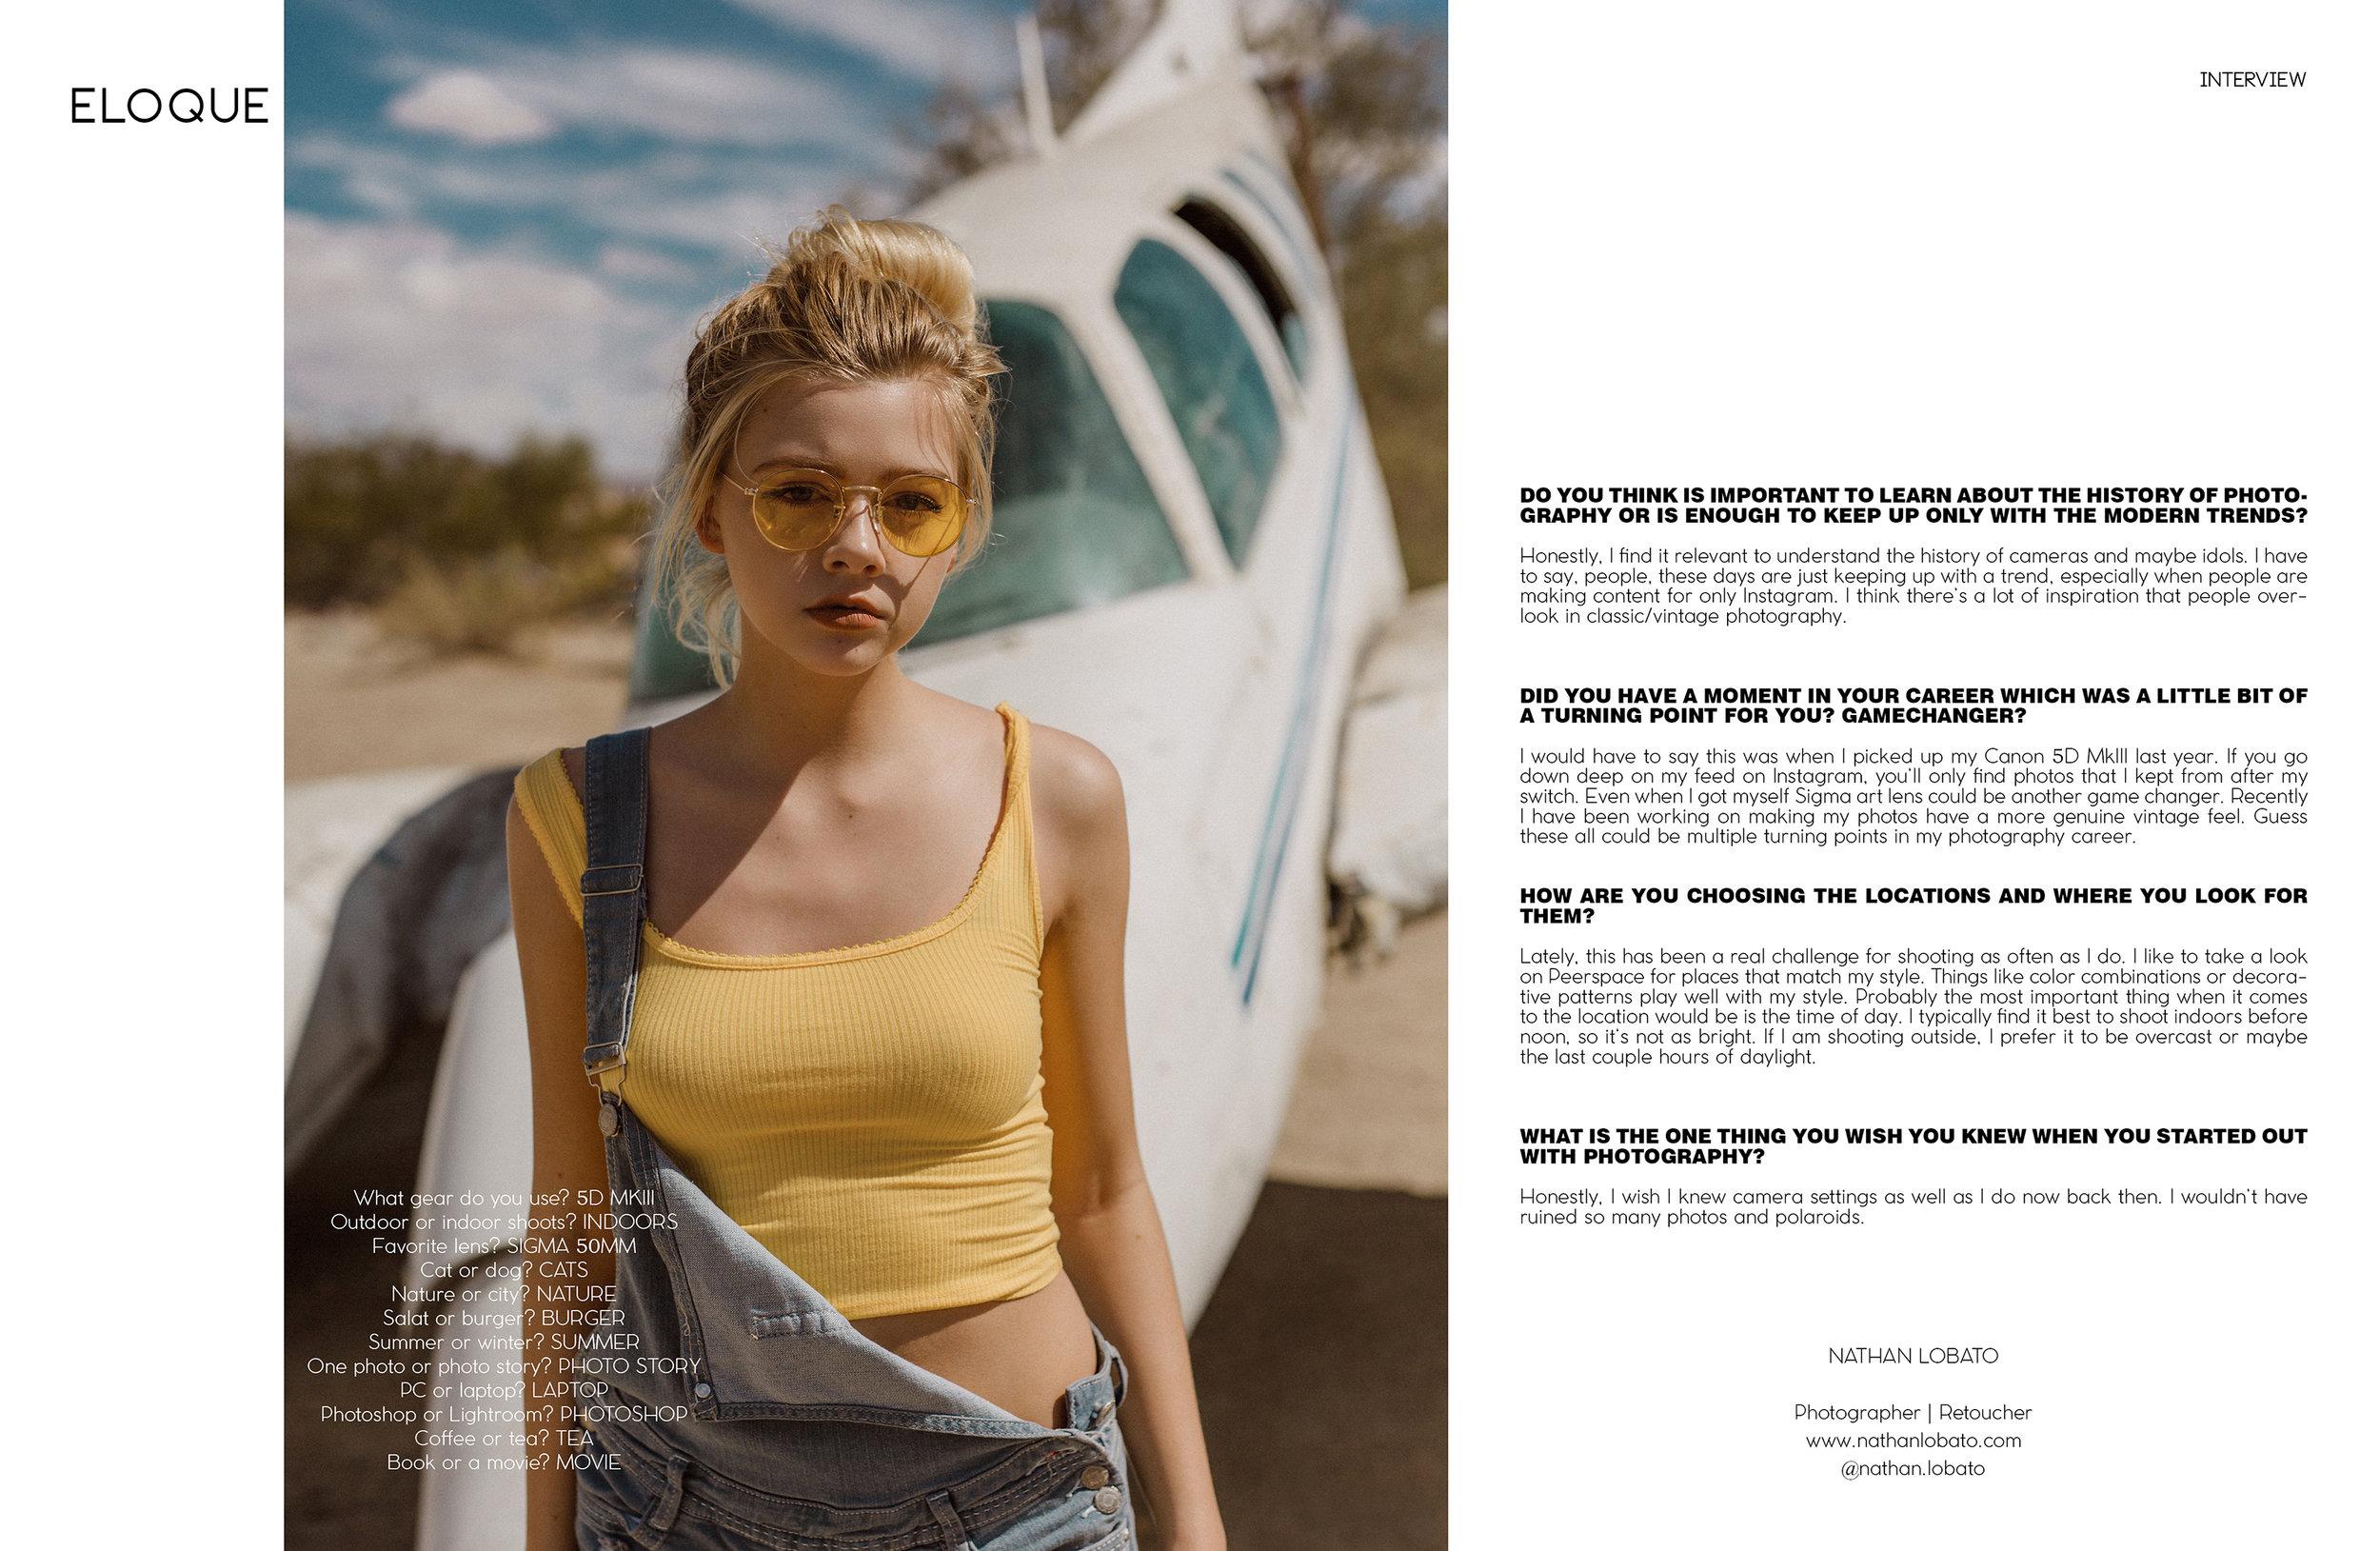 ELOQUEmagazineJUNE10.jpg